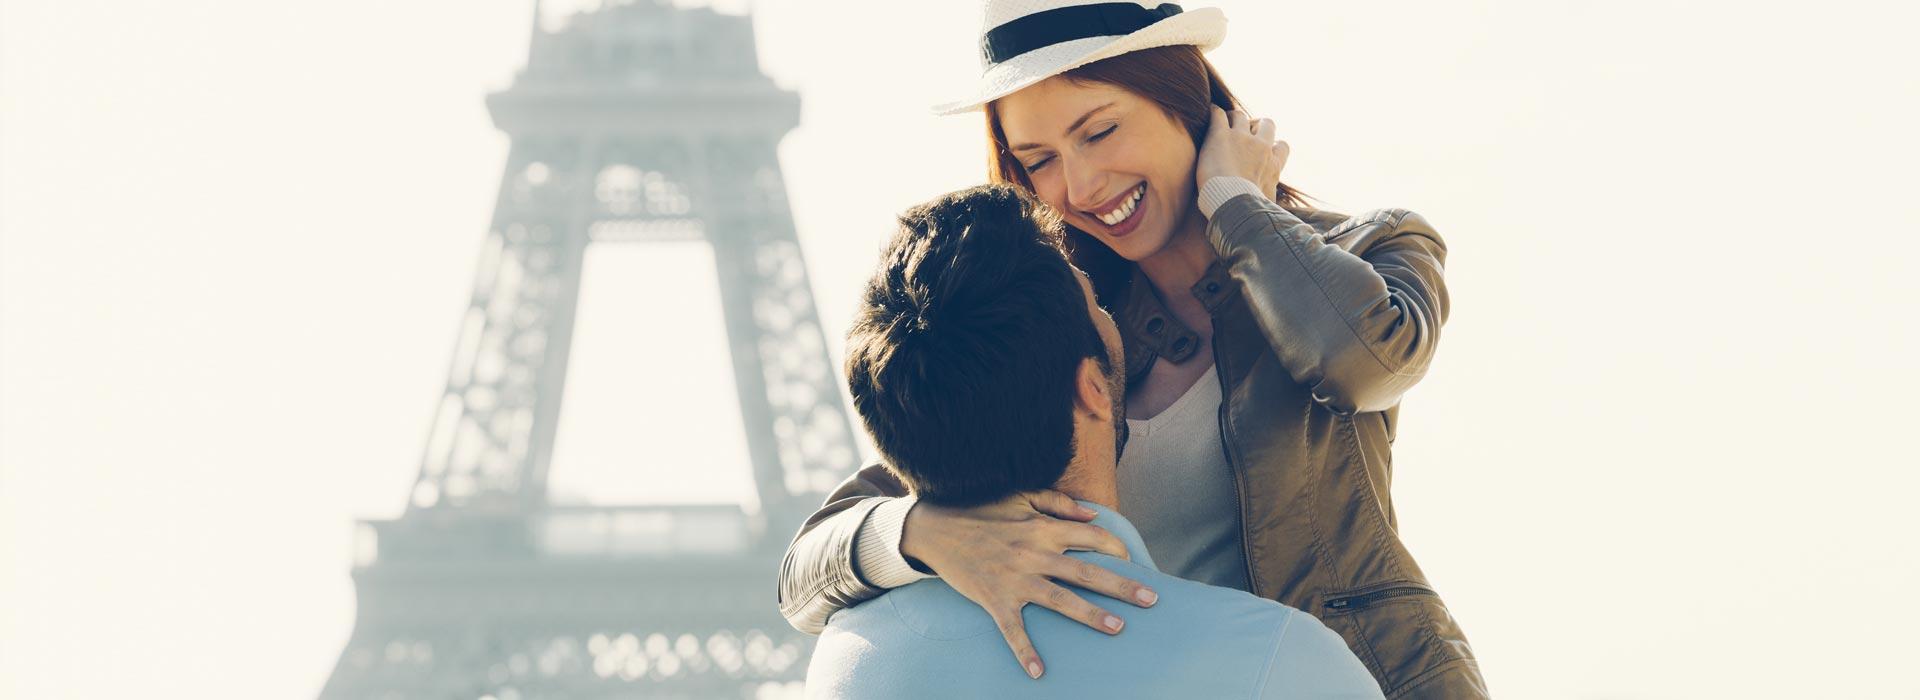 Agence matrimoniale paris 17